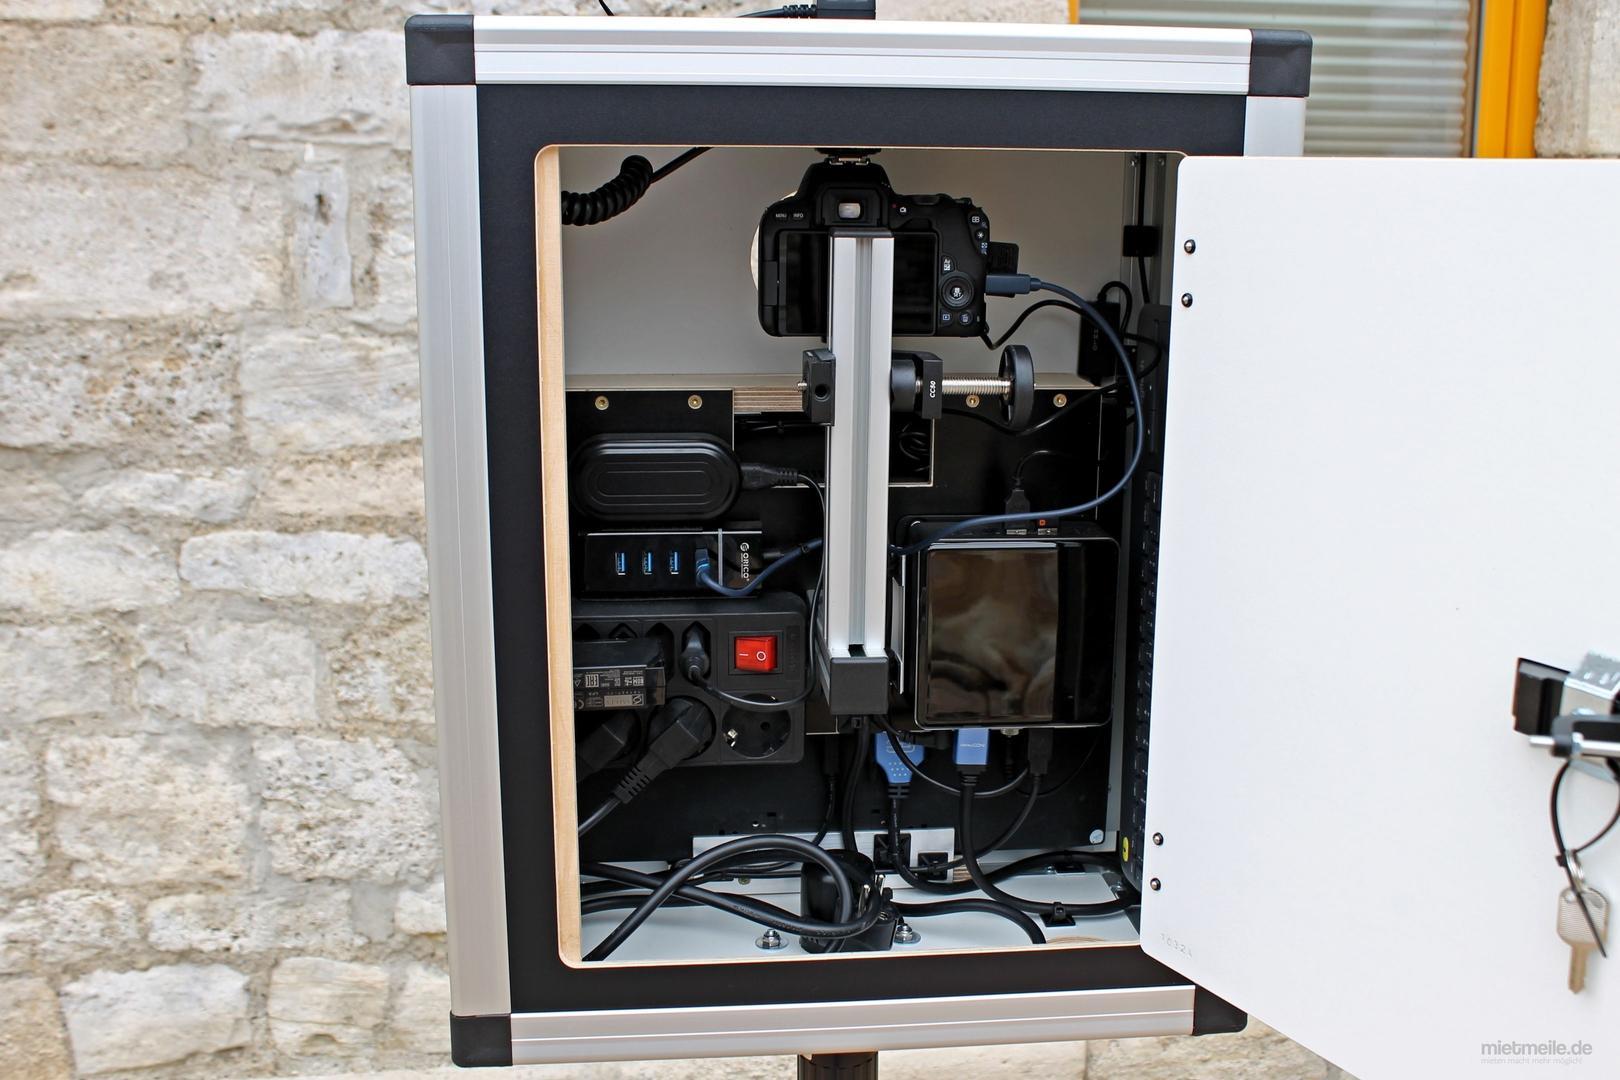 Fotobox mieten & vermieten - Fotobox Photobox Fotoautomat Photo booth Photobooth in Gröningen